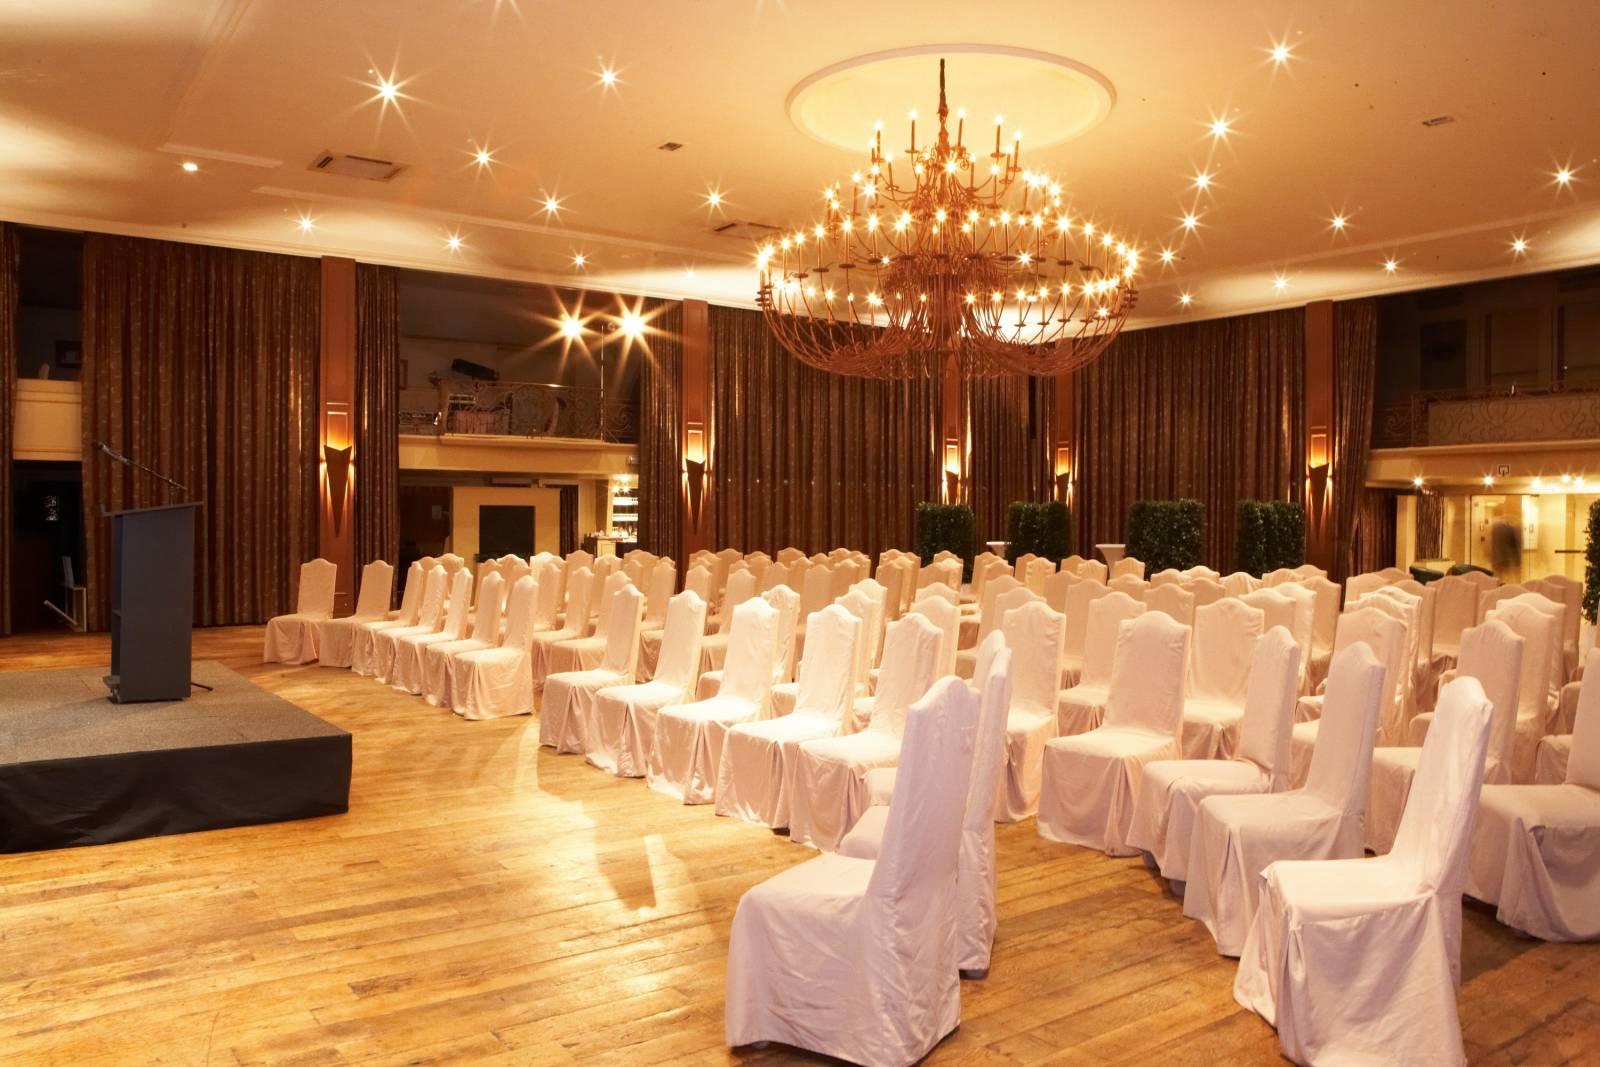 Cortina Wevelgem - Feestzaal - House of Weddings (6)